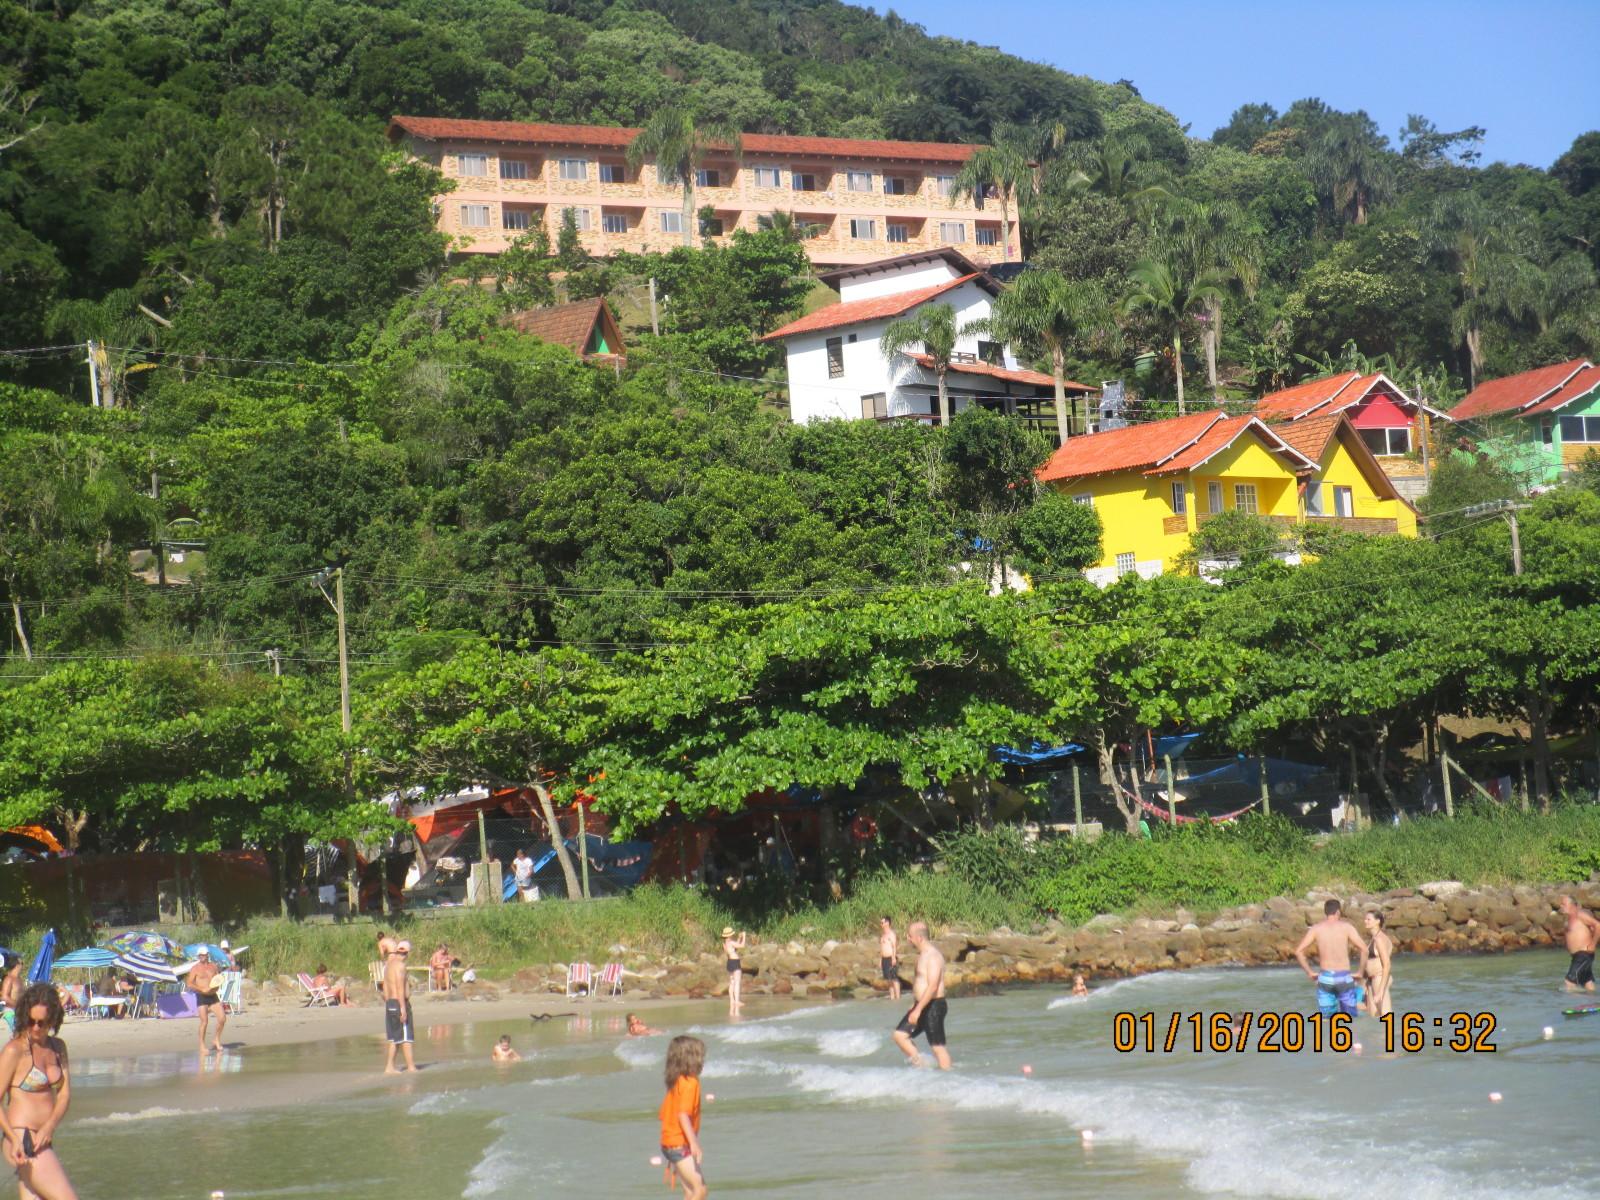 Informe Camping en Brasil - Camping 4 Ilhas - Bombas y Bombinhas 2znxtex